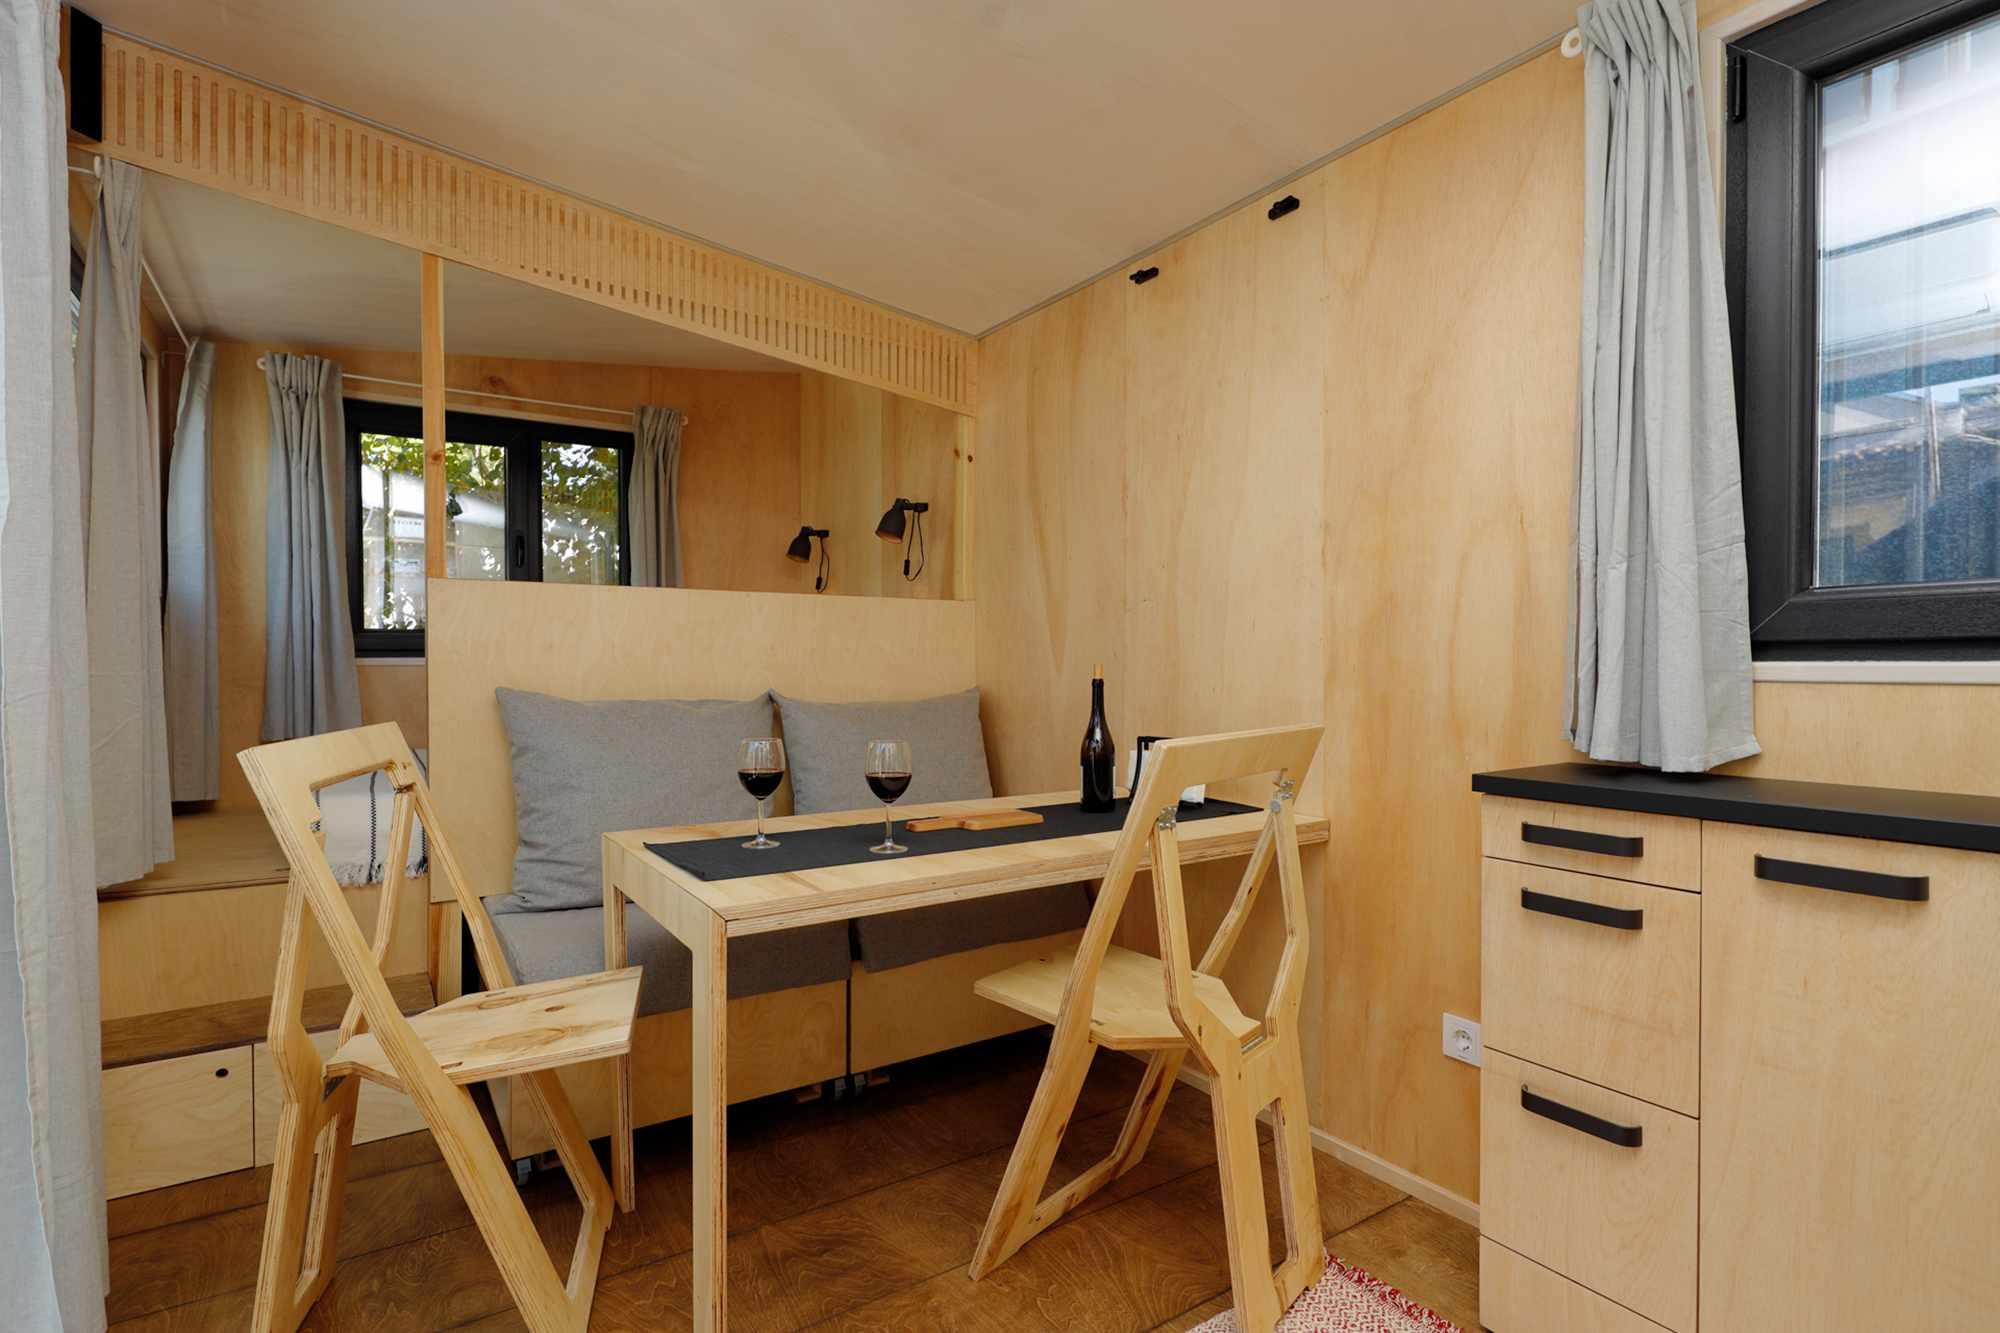 EBH 659 tiny house Ecobox Home Ltd. dining room mode